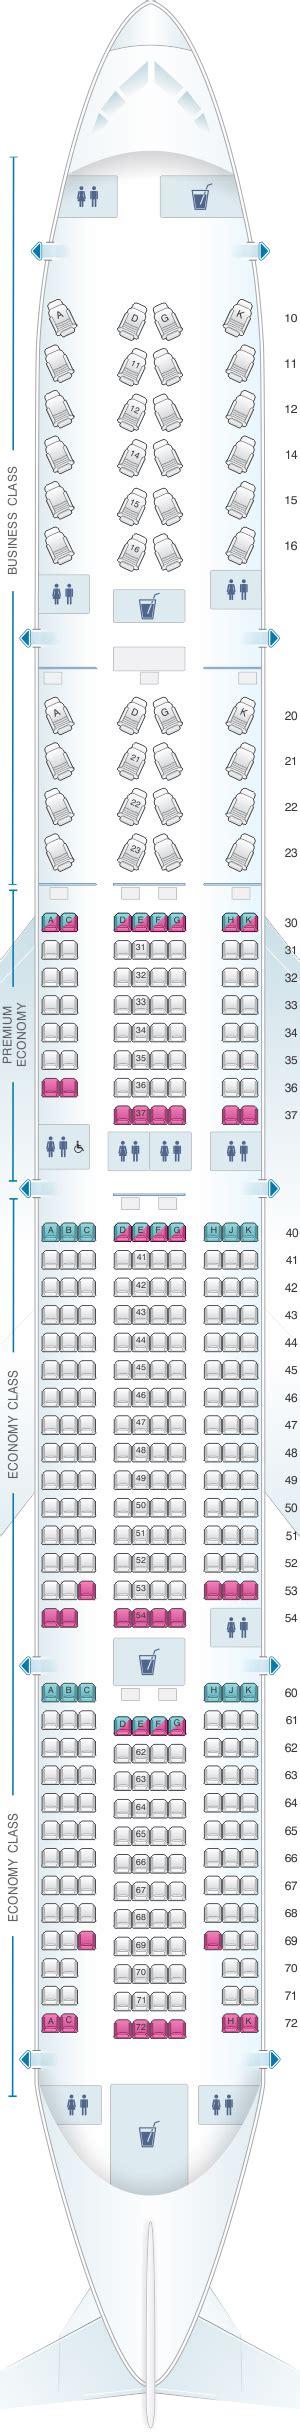 plan si es boeing 777 300er air mapa de asientos china airlines boeing b777 300er plano